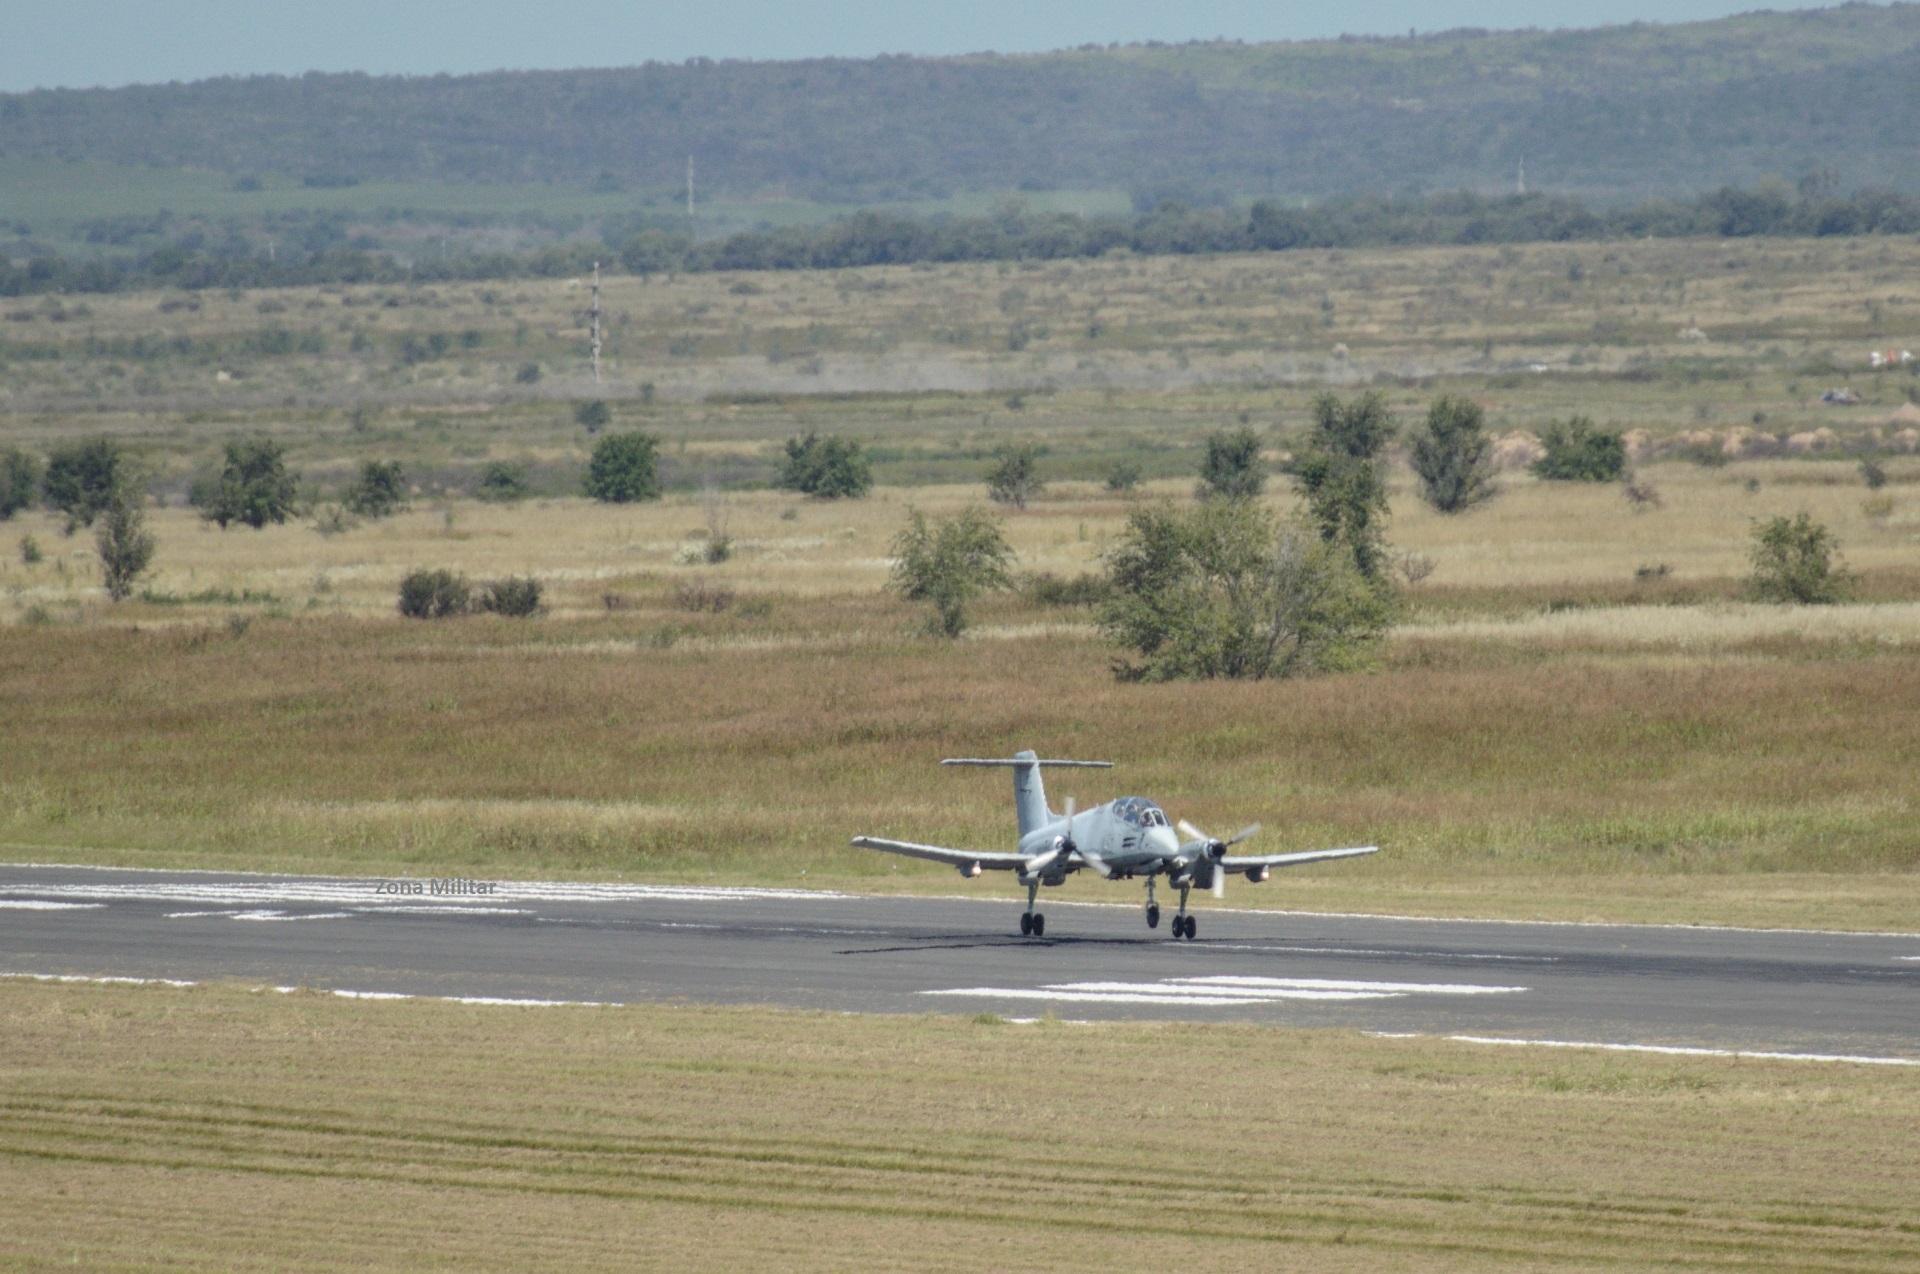 Argentina - Página 8 IA-58-Pucara-EAM-4